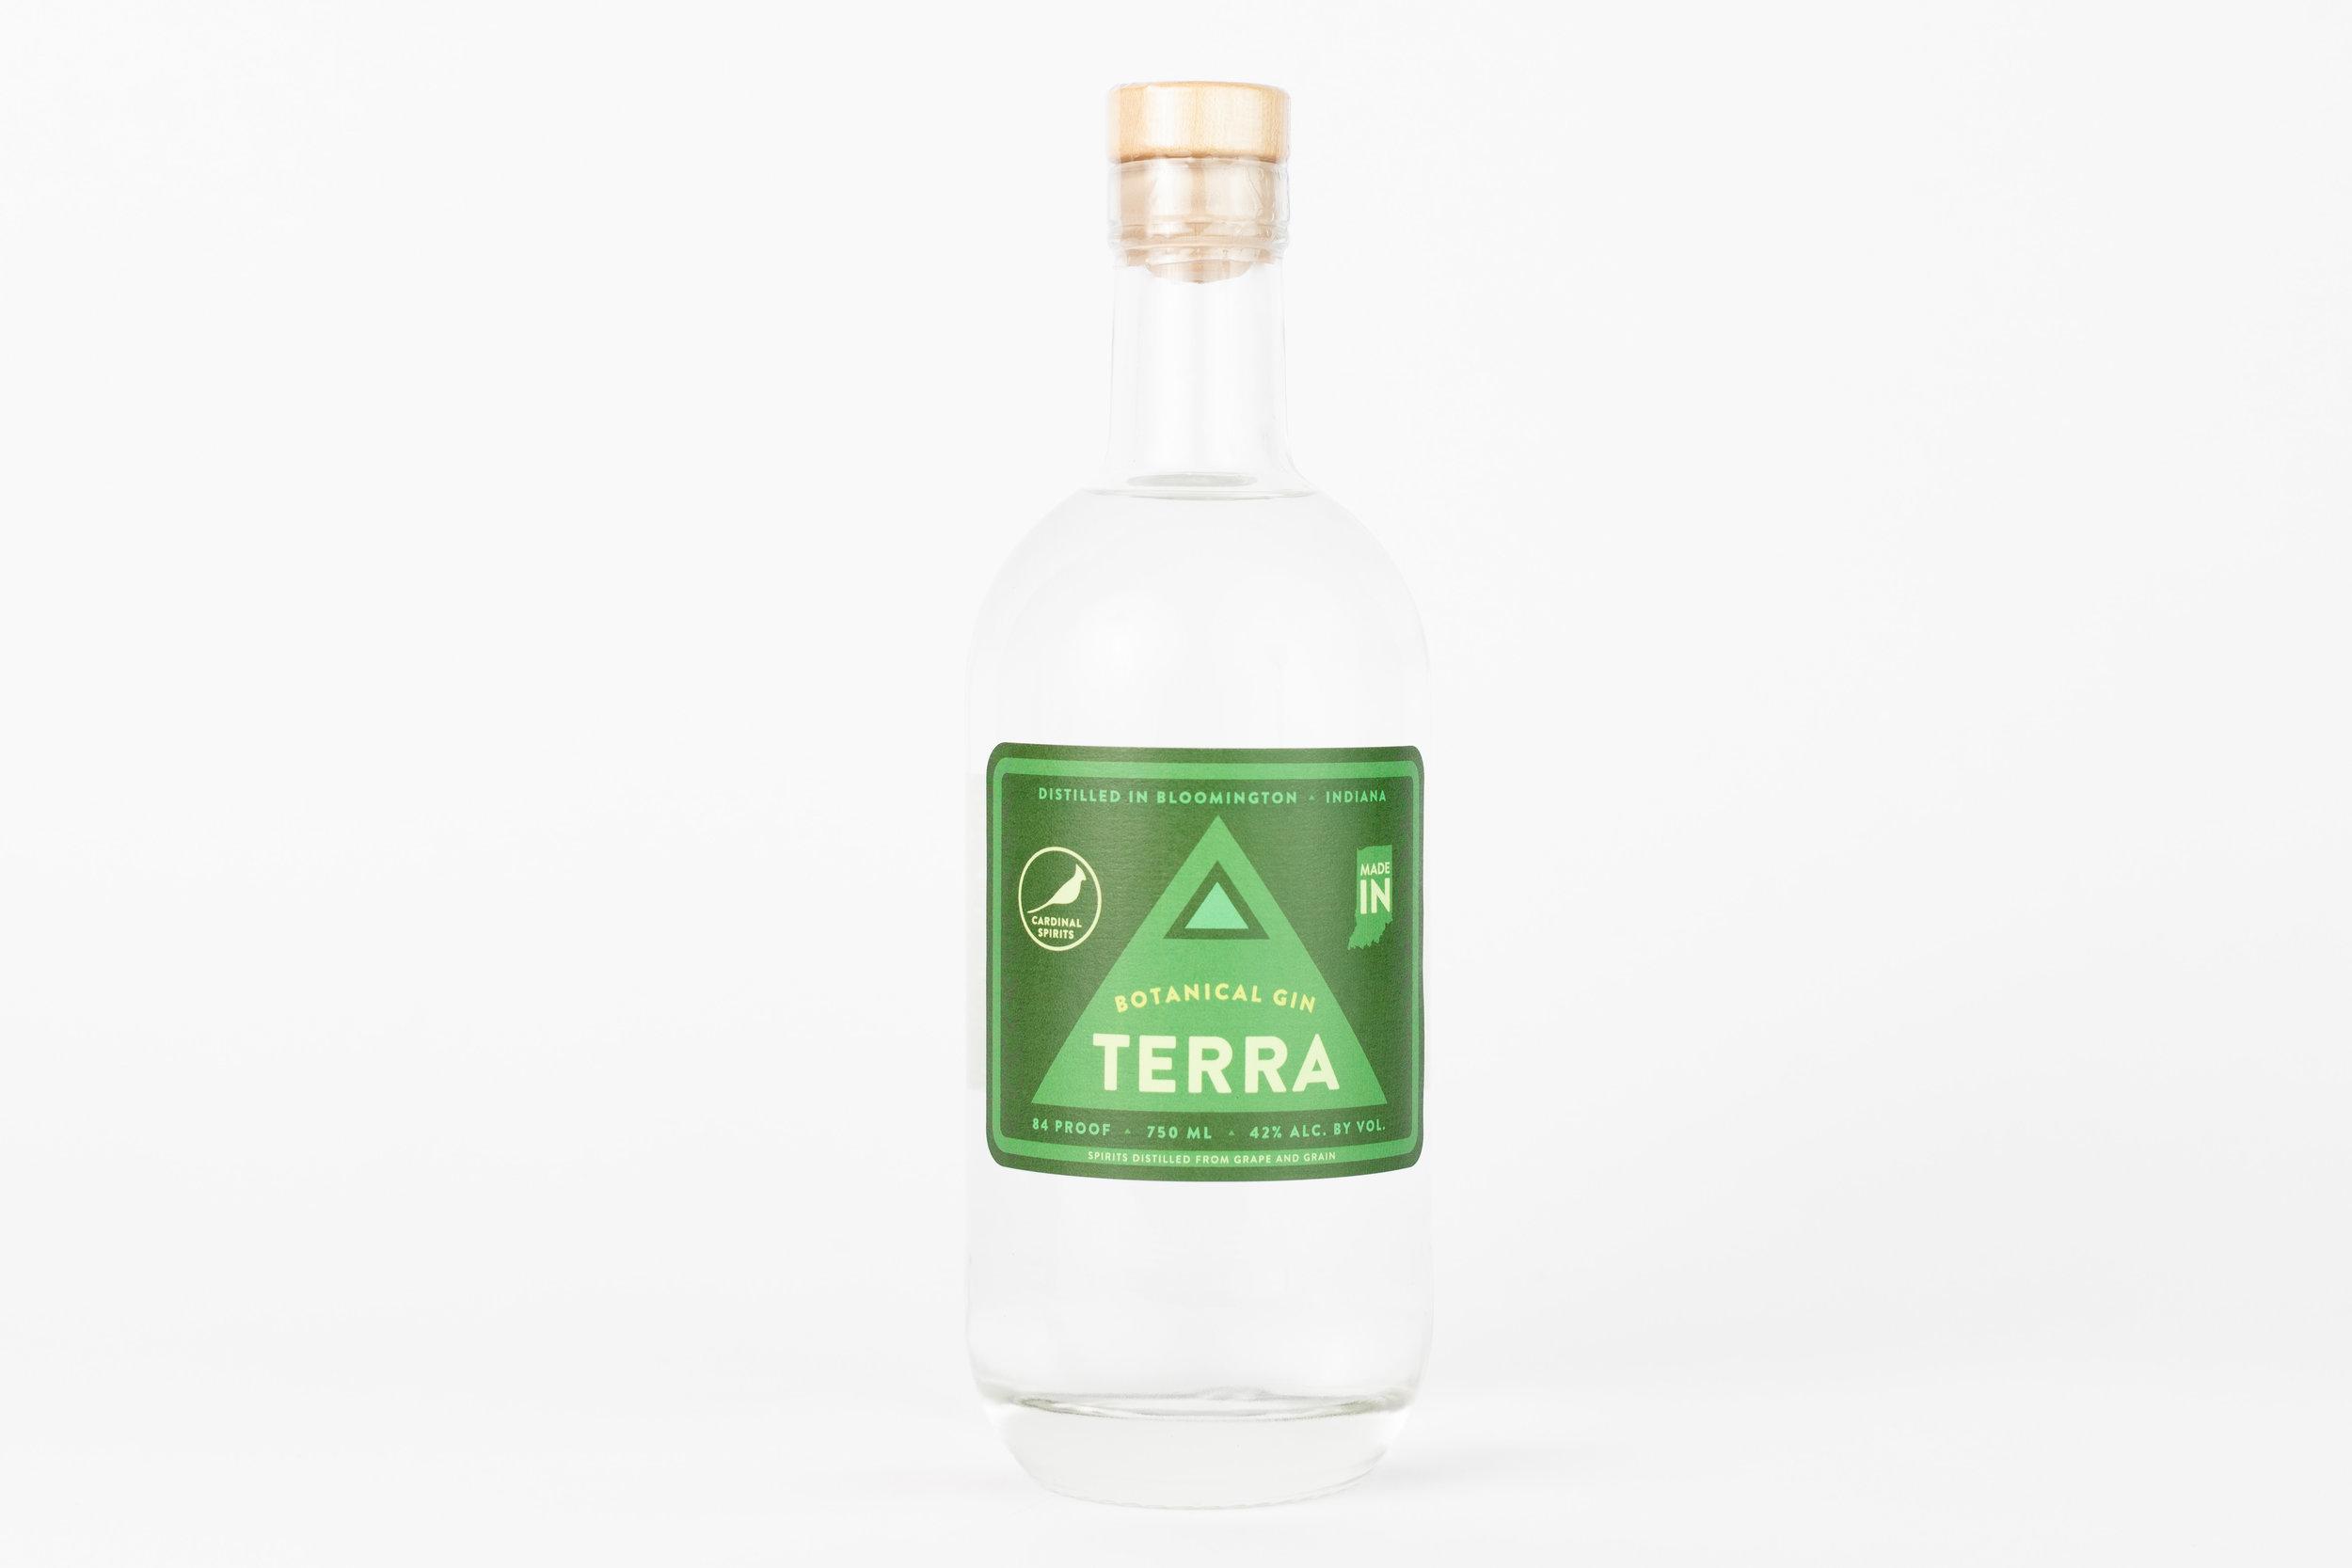 TerraGin-March2019-WhiteBG.jpg